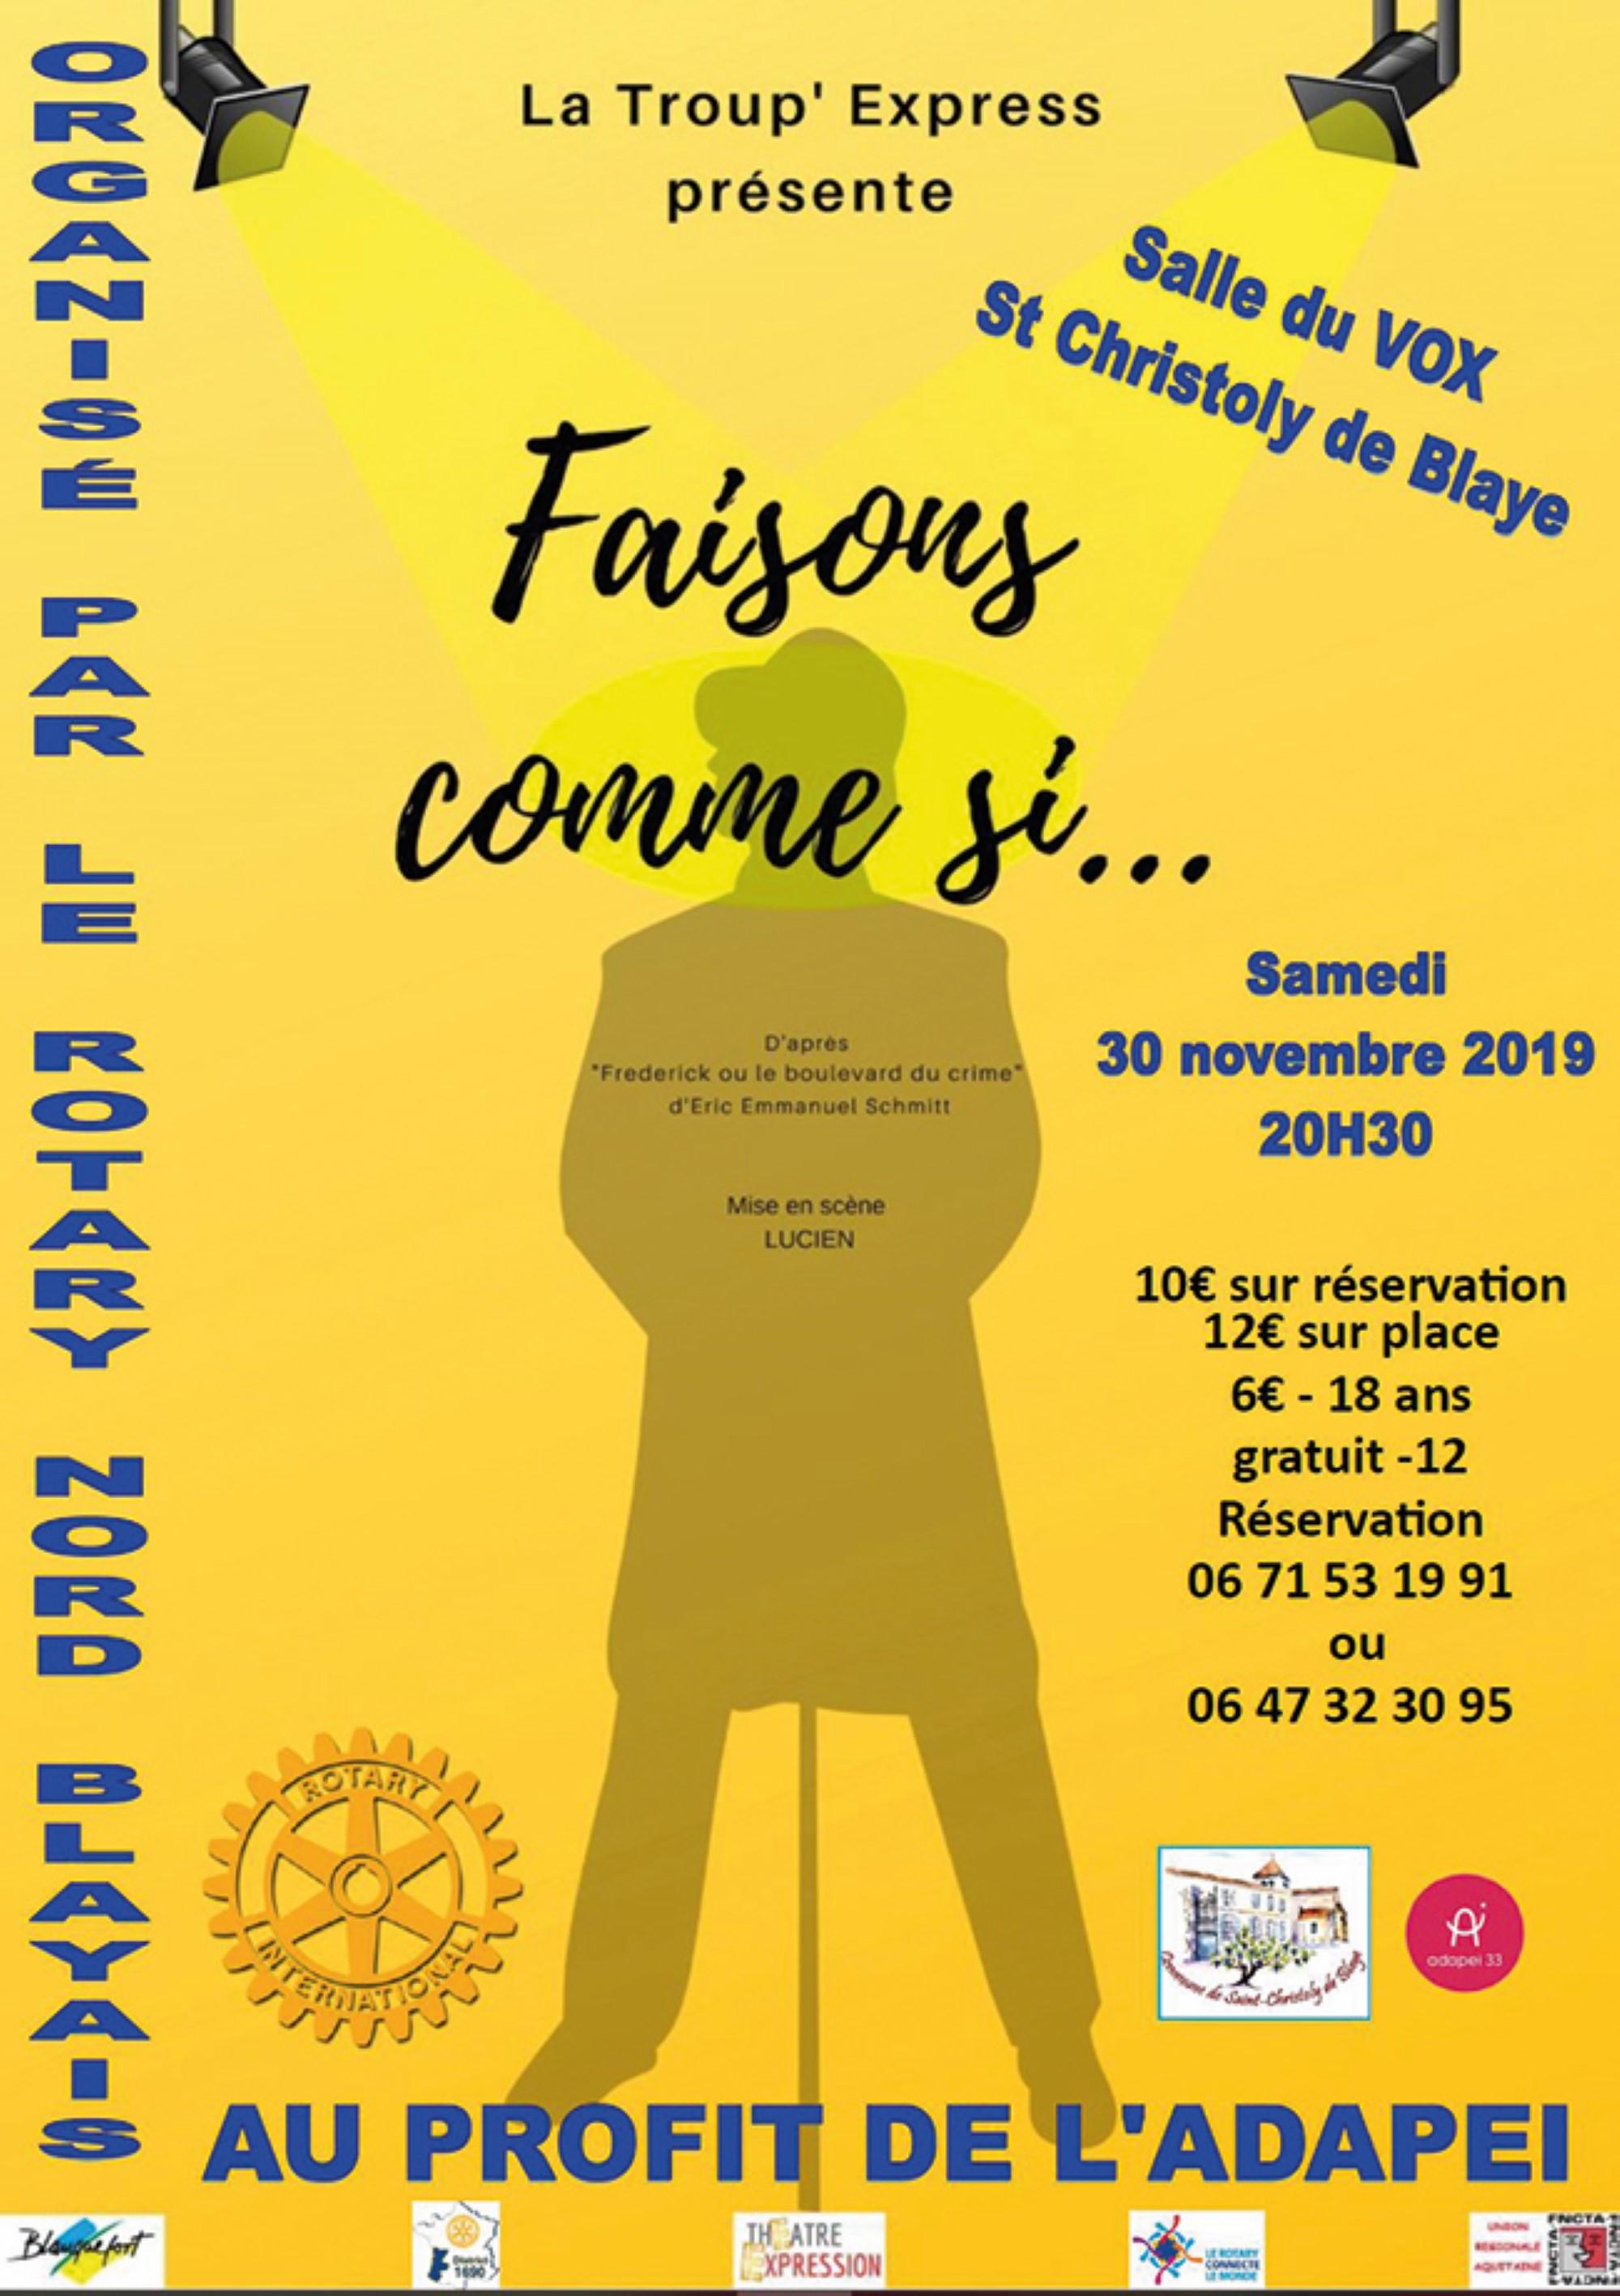 Soirée Théâtre organisée par le Rotary Club Nord Blayais